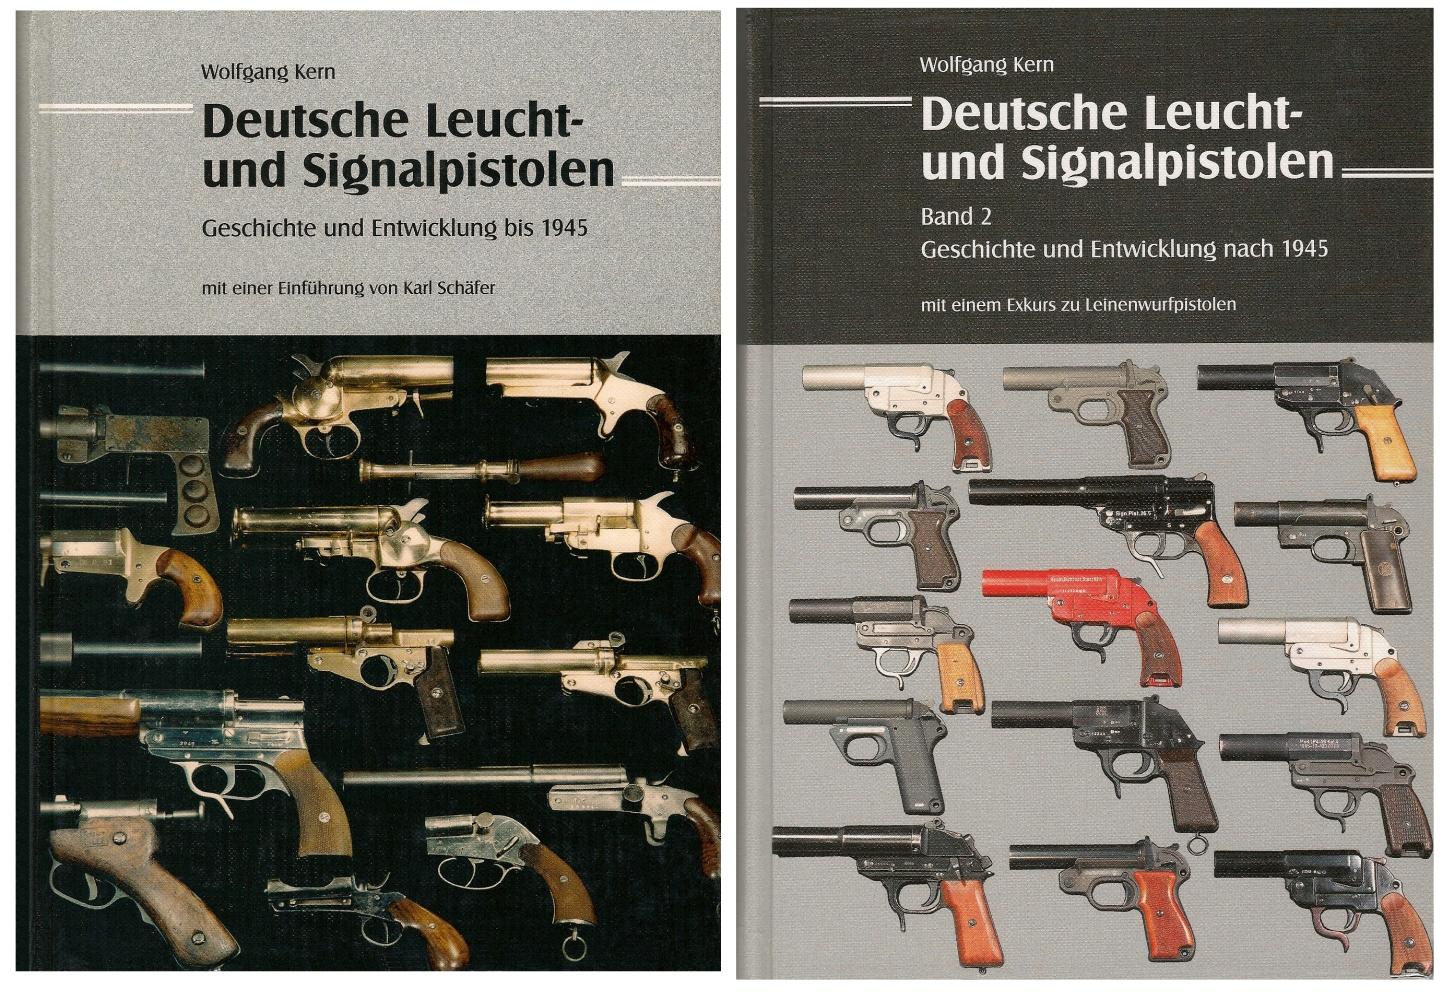 « Deutsche Leucht- und Signalpistolen » par Wolfgang Kern, tomes 1 (jusqu'à 1945) et tome 2 (après 1945).